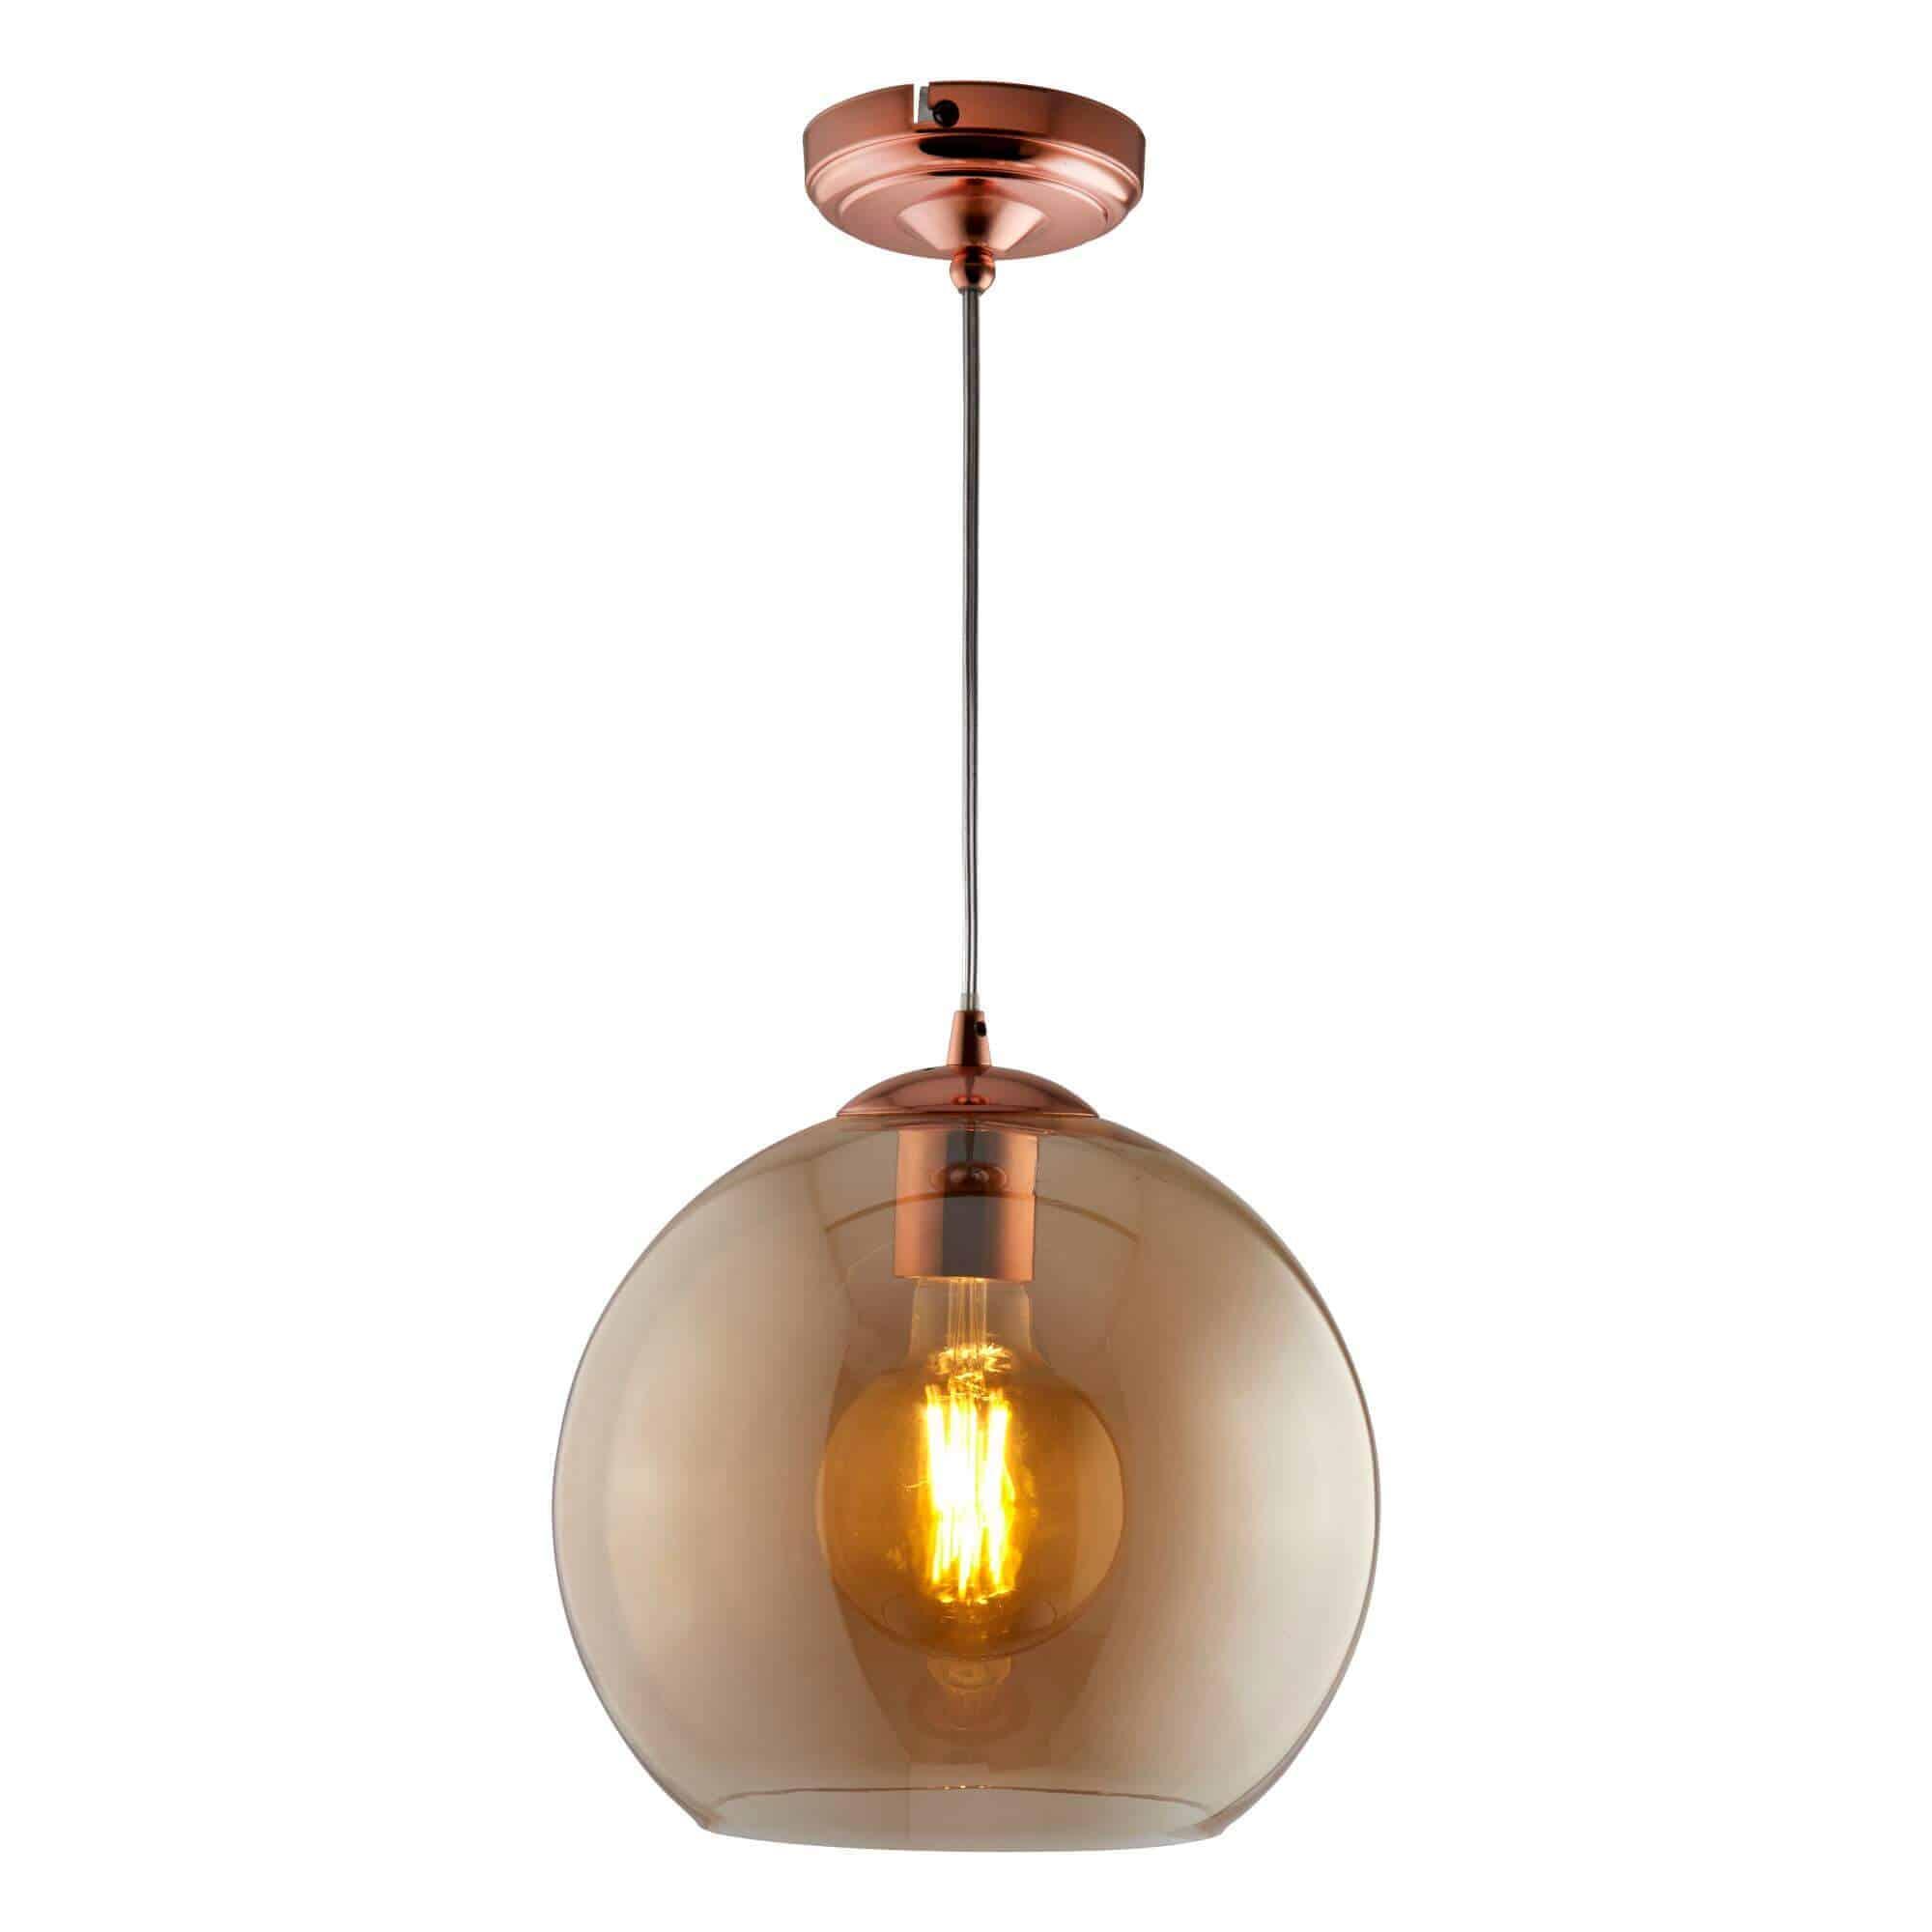 1635AM – Searchlight Balls Amber 1 Light Round Pendant (35Cm Dia)